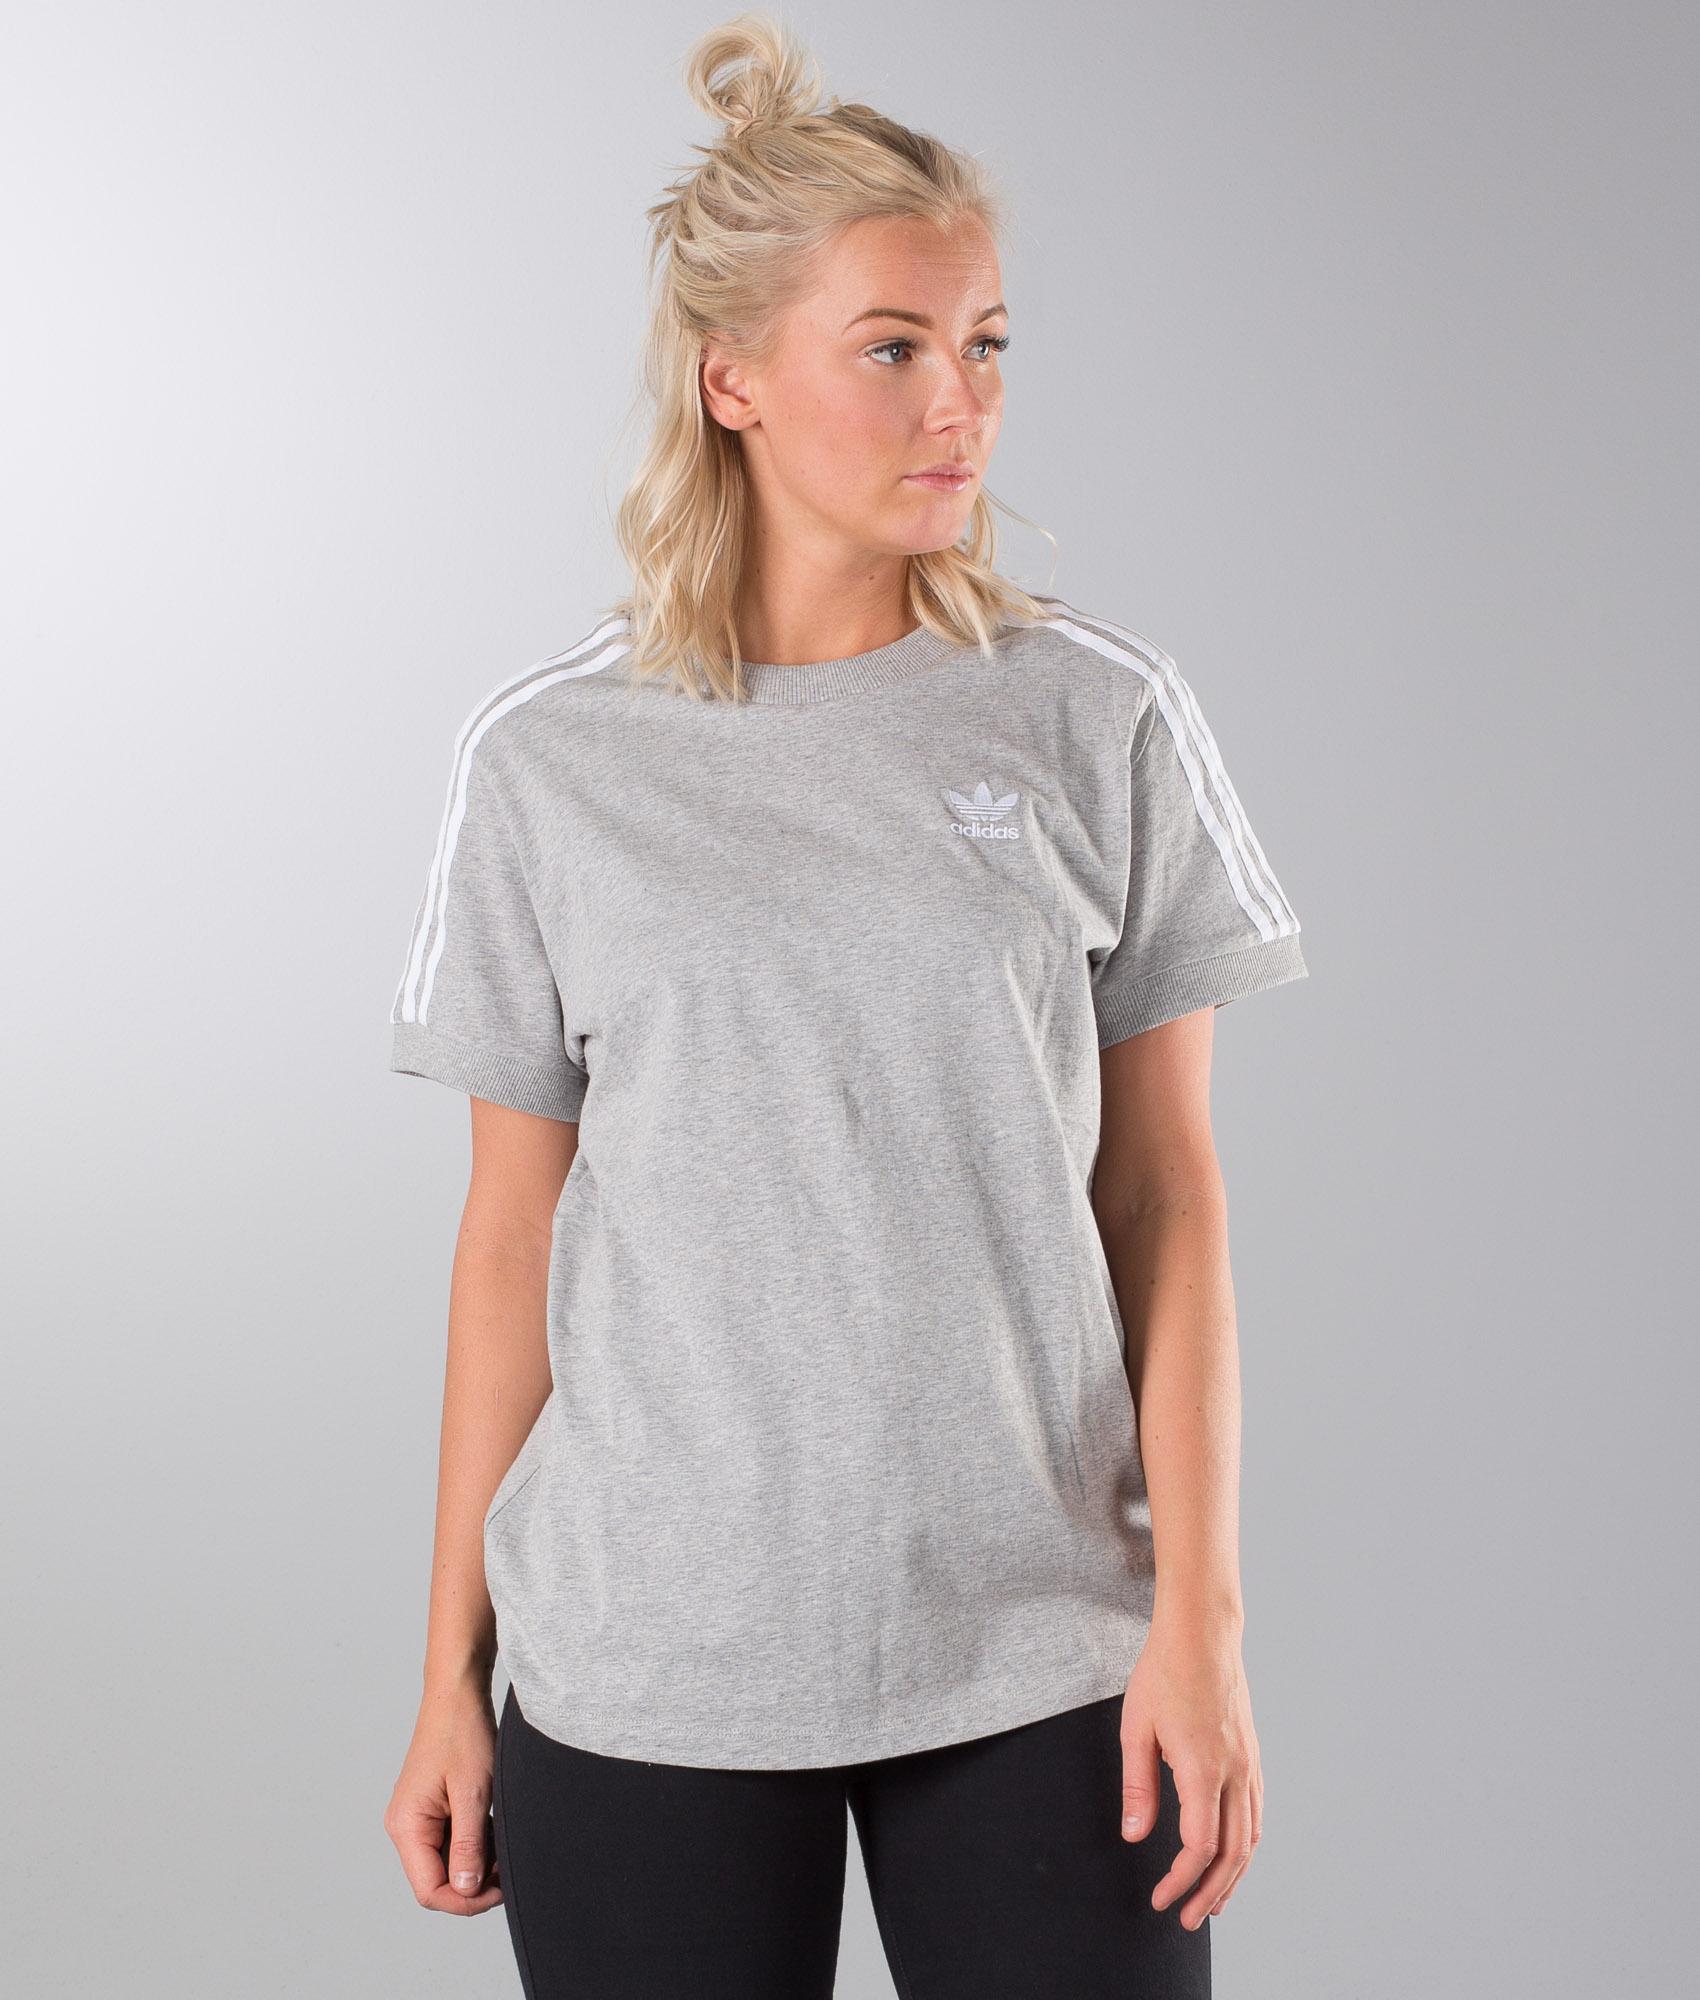 Adidas Originals 3 Stripes T Shirt Medium Grey Heather